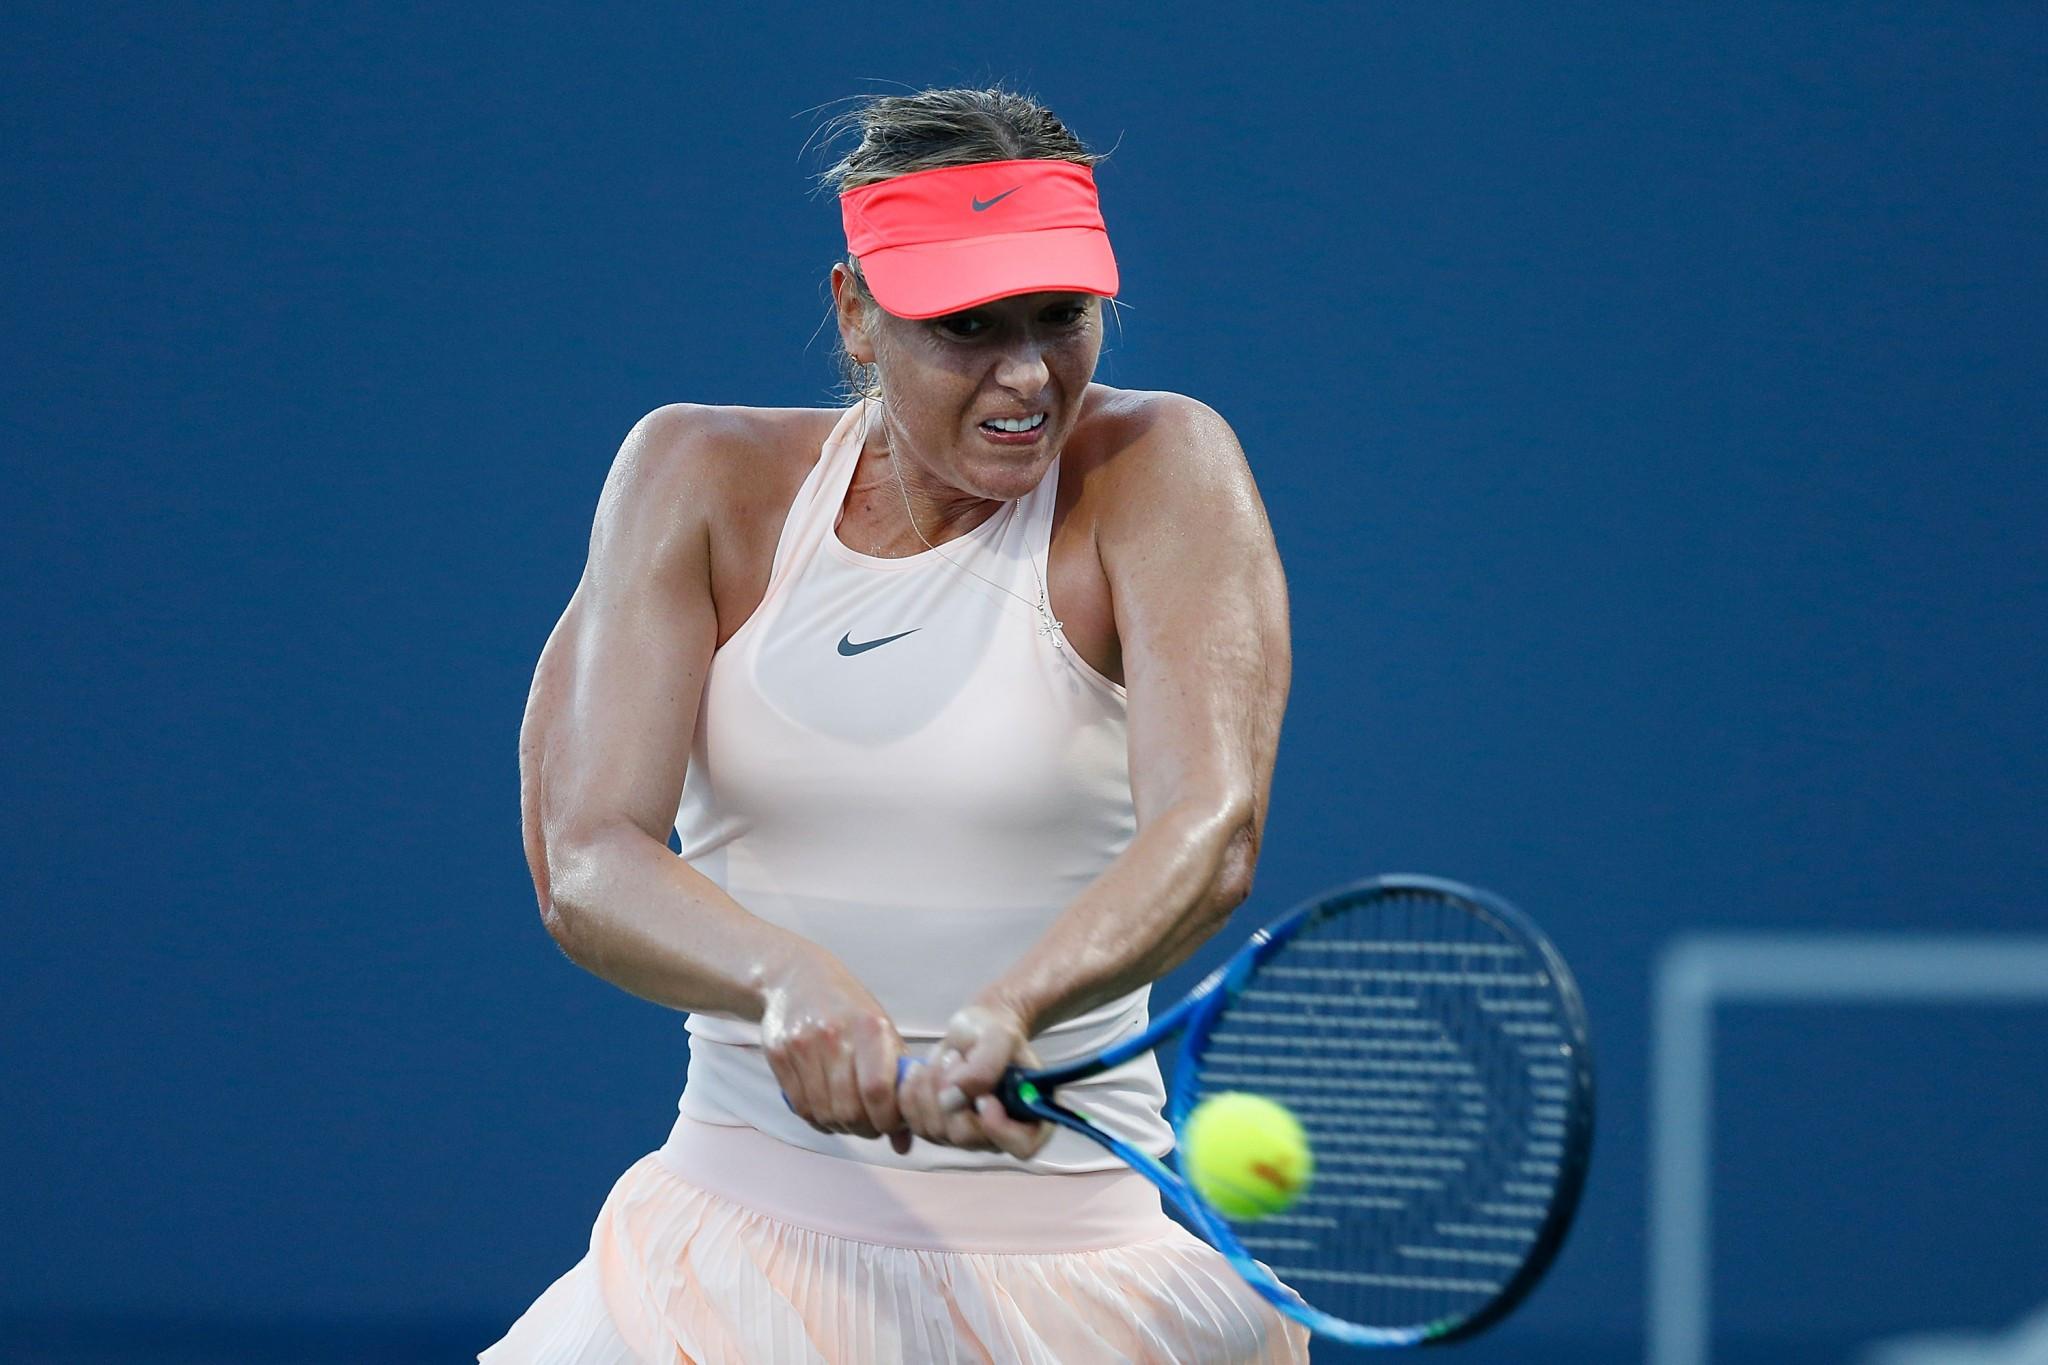 Sharapova awarded wildcard for US Open